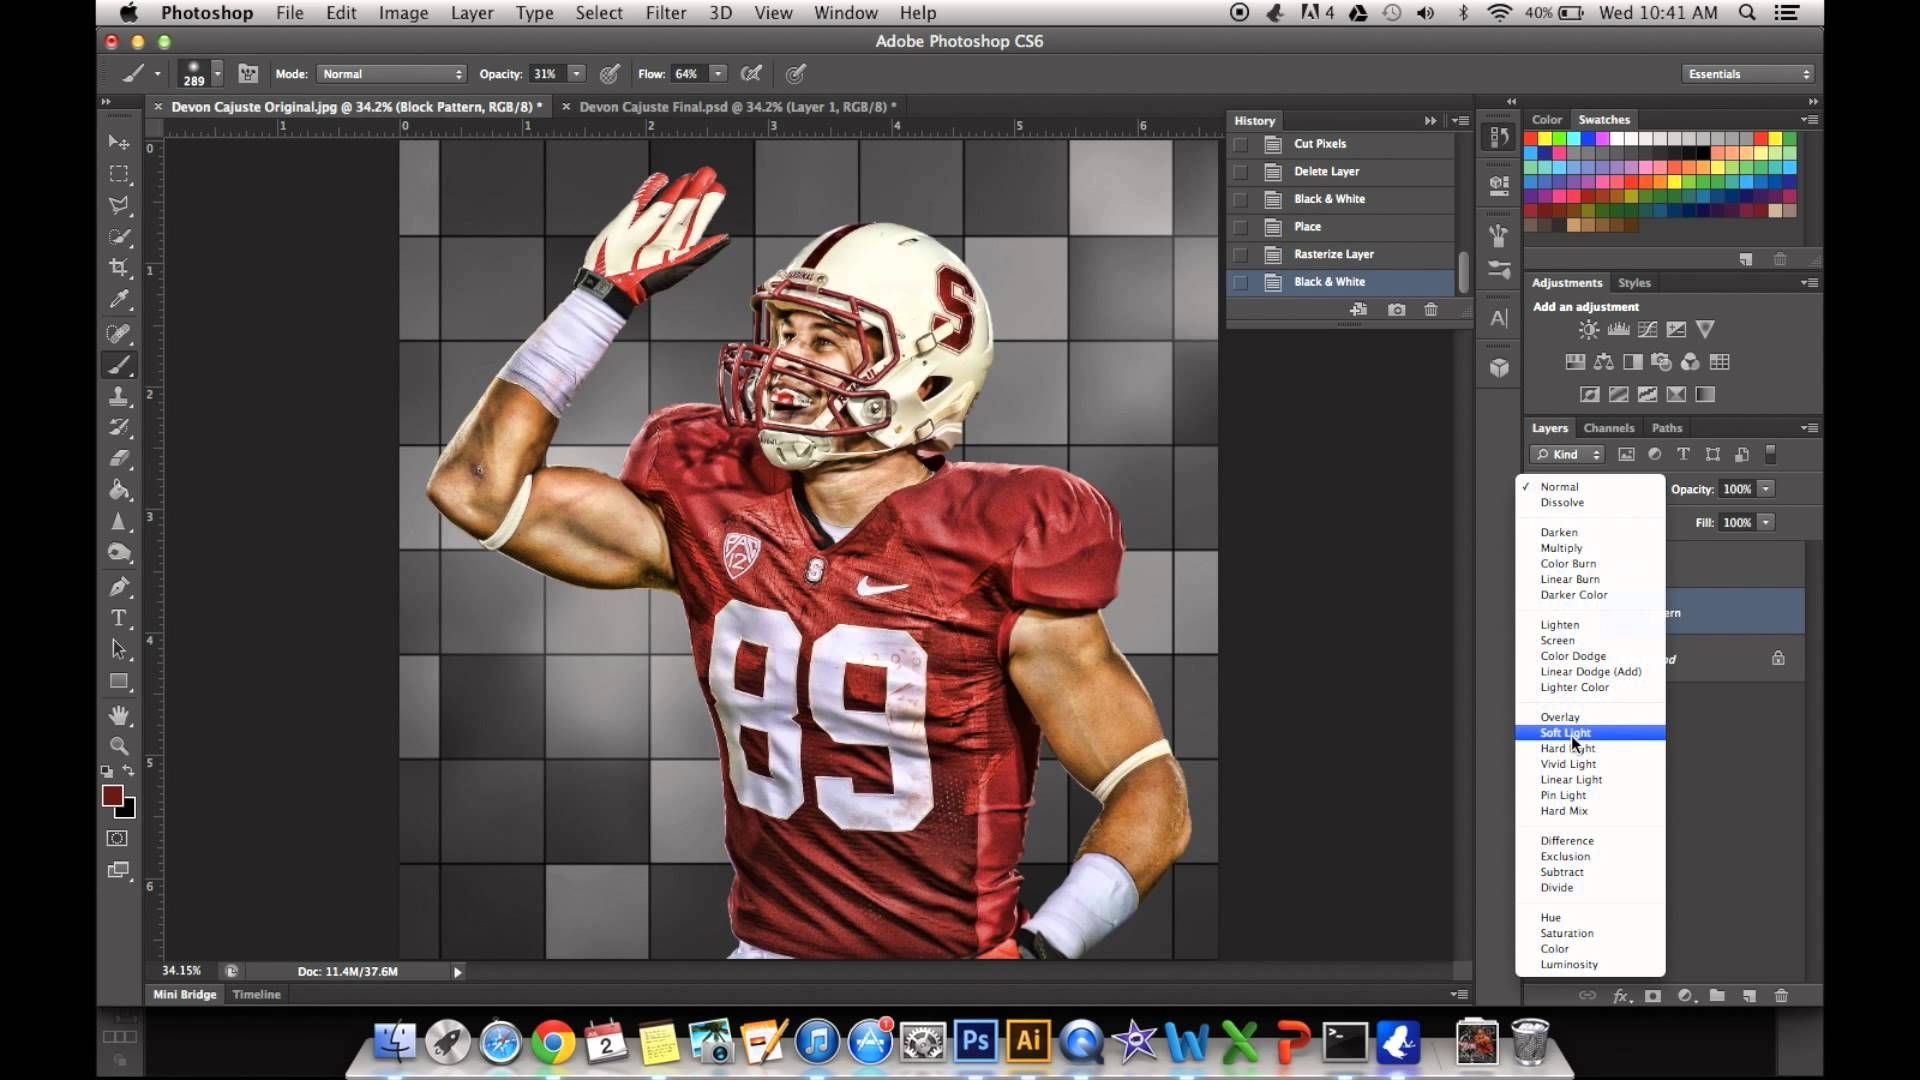 Photoshop Cs6 Sports Editing Tutorial Editing Tutorials Photoshop Photo Editing Photoshop